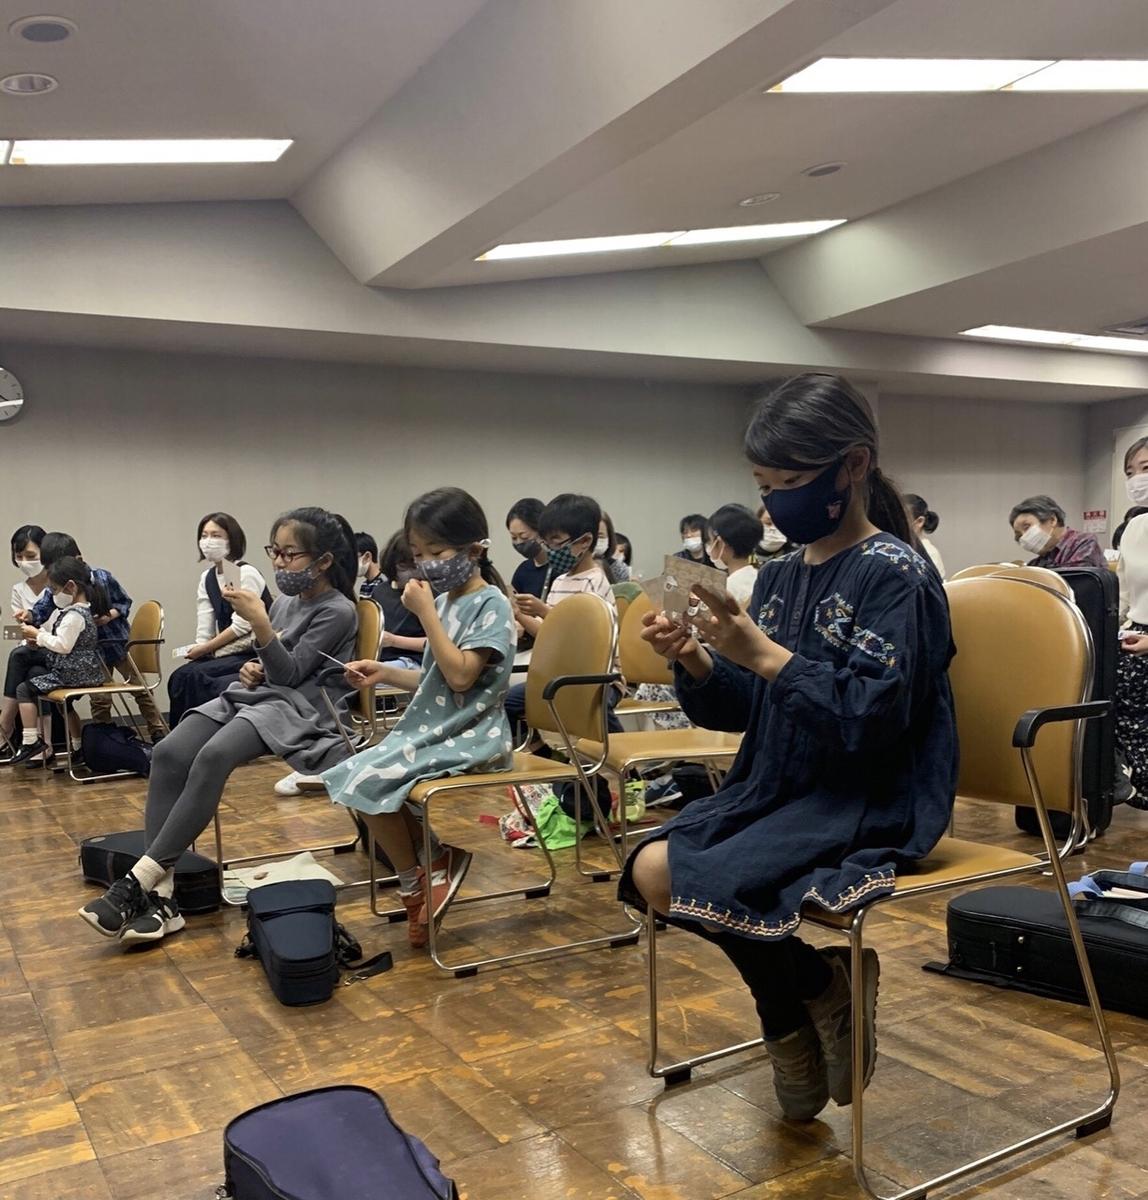 f:id:suzukimethod-kokubunjishibu:20210426191745j:plain